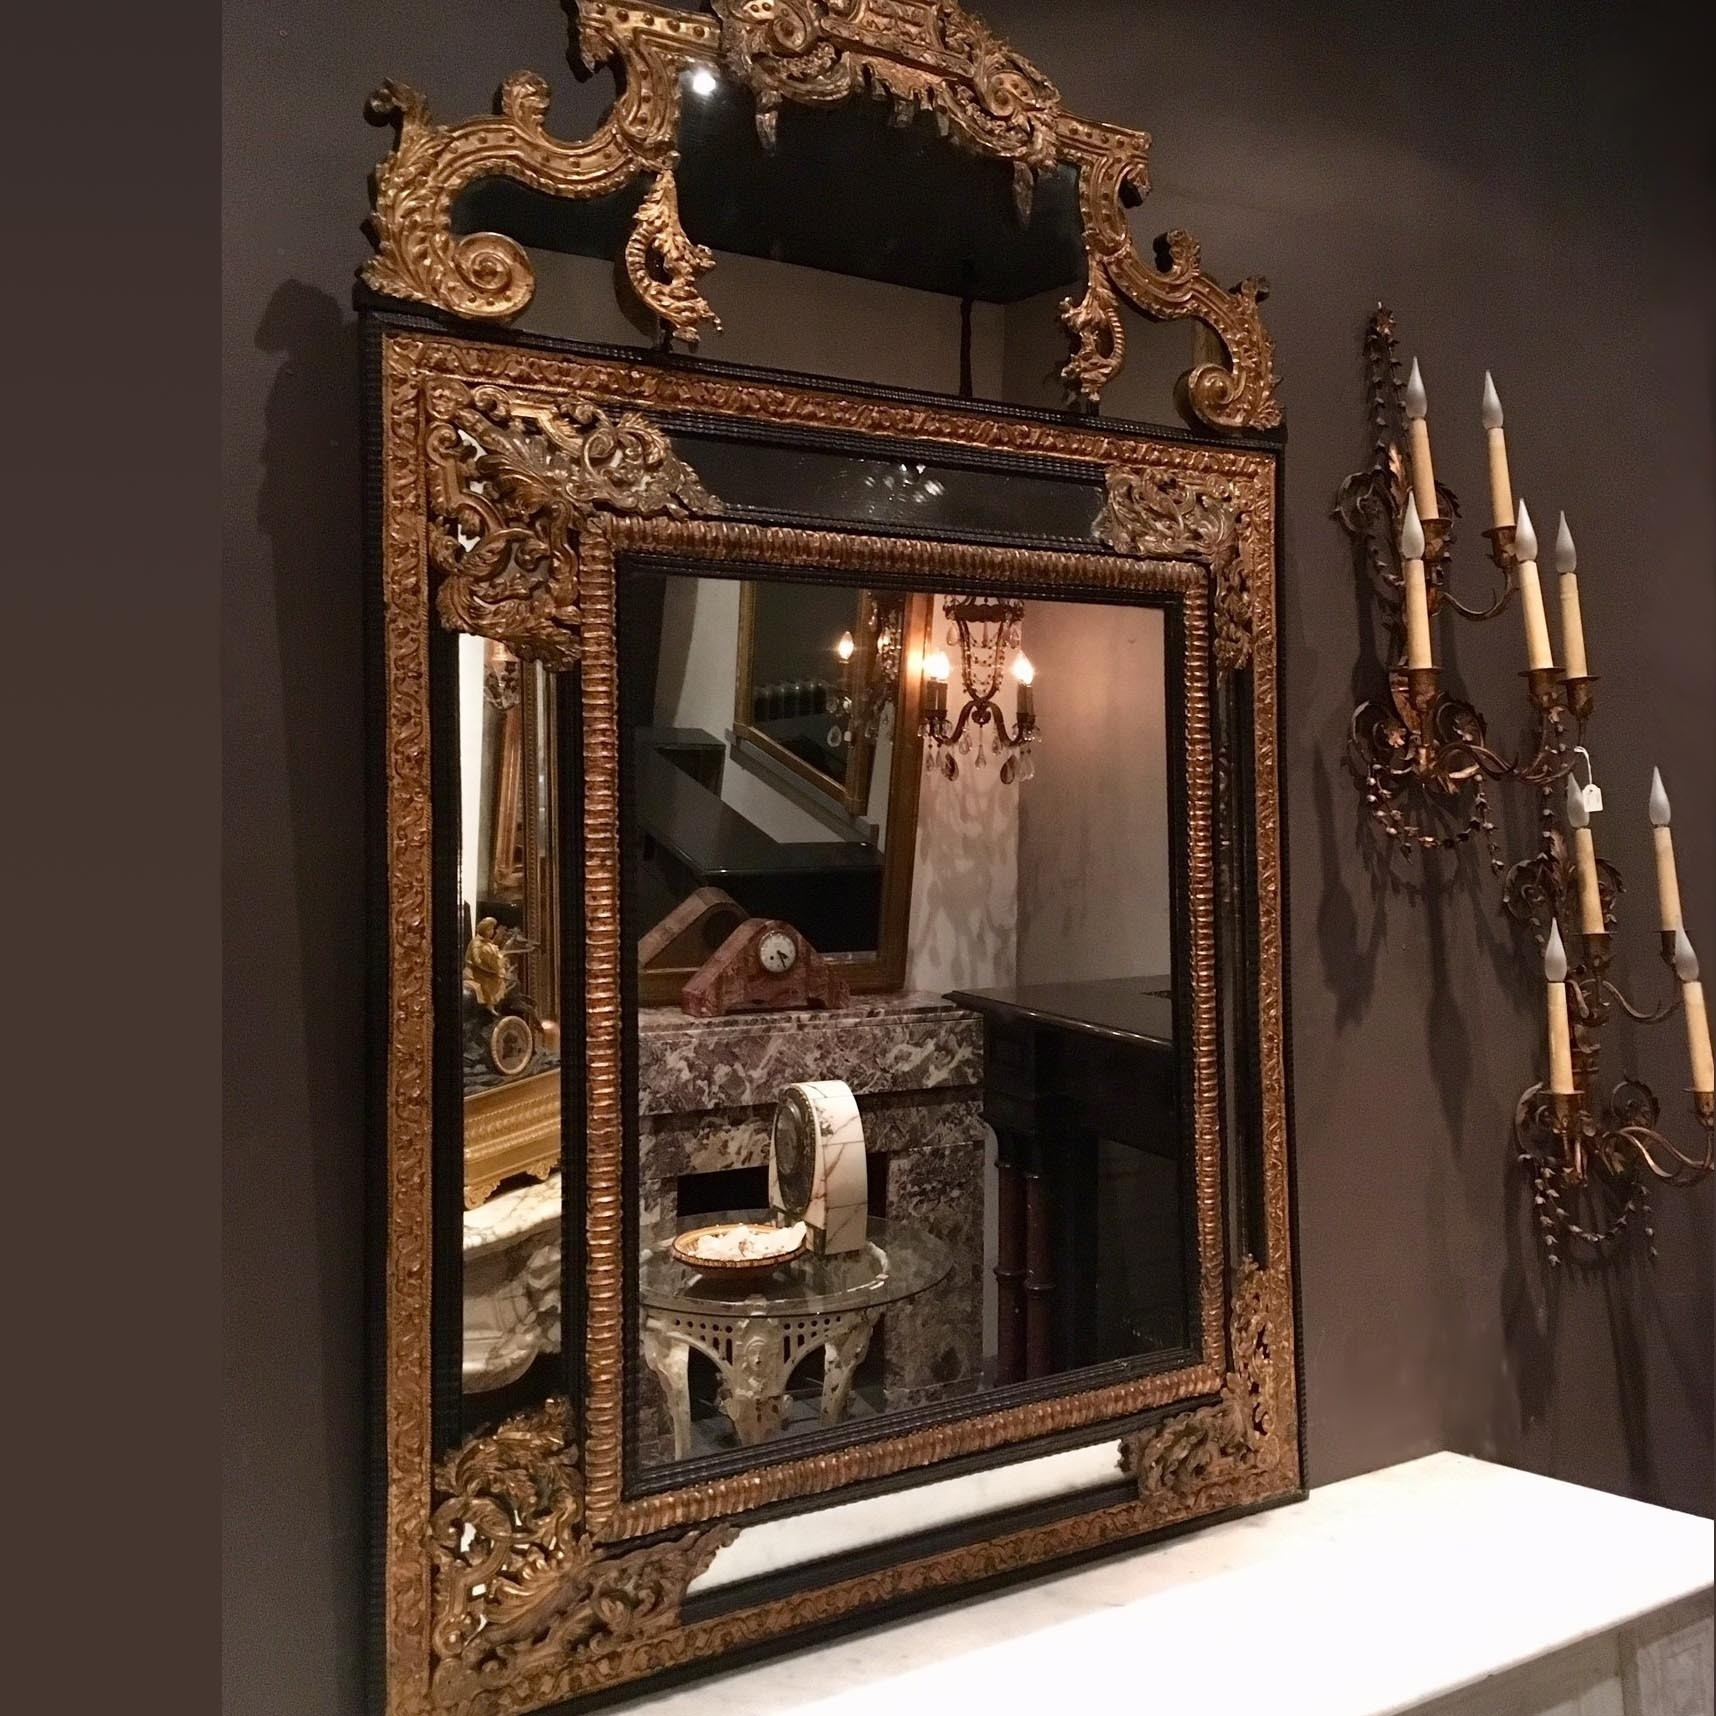 Prachtige rijk gedecoreerde spiegel